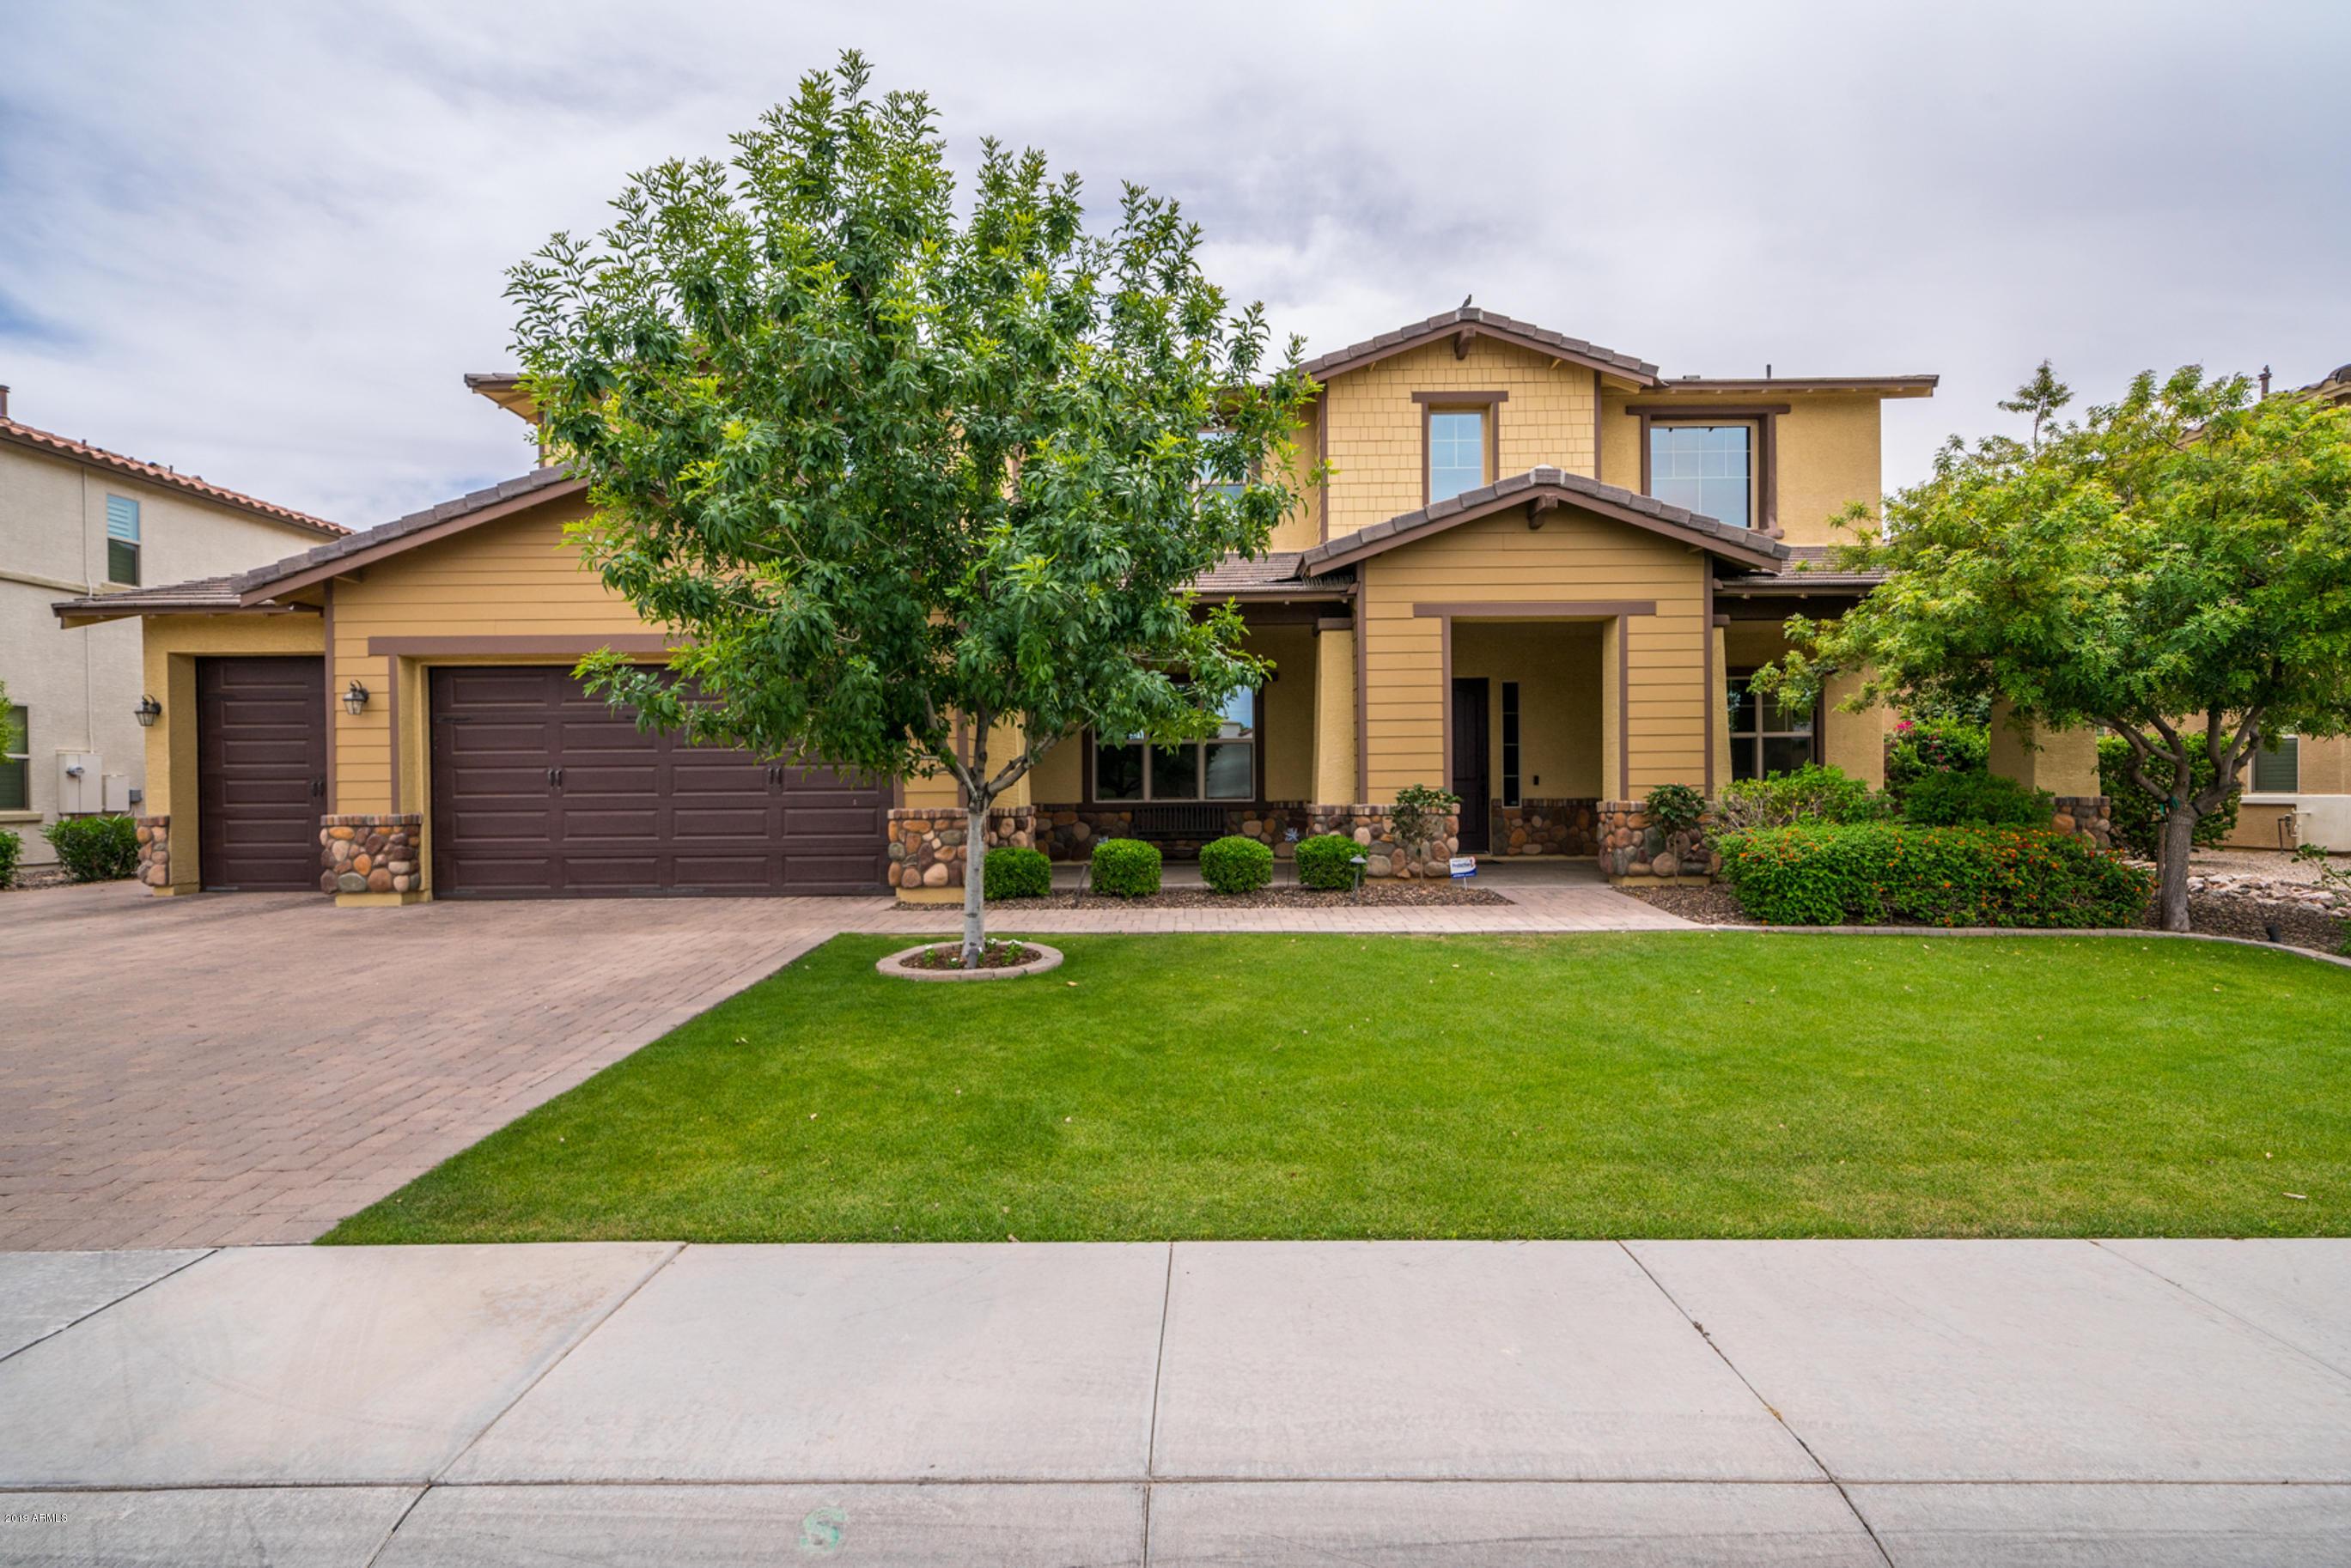 Photo of 3941 E ELLIS Street, Mesa, AZ 85205